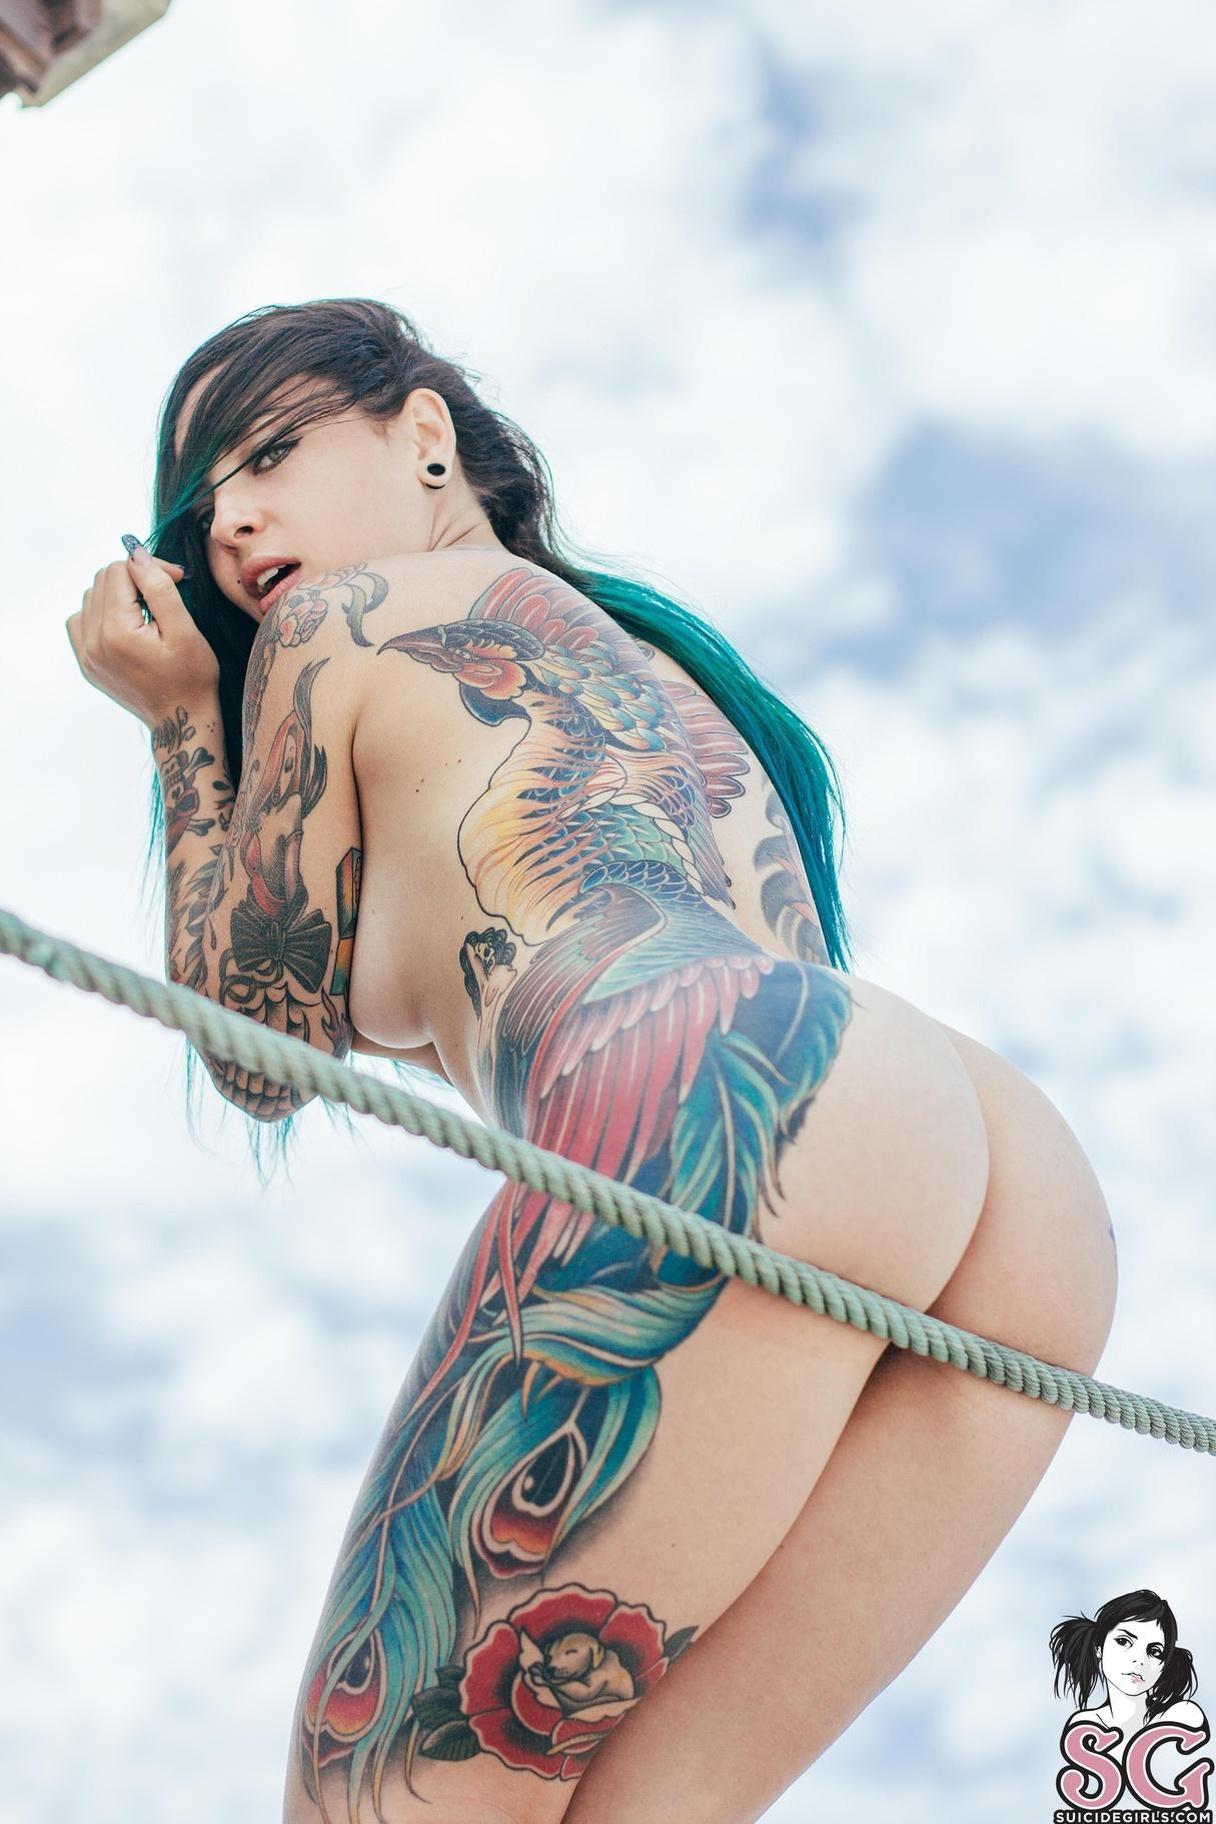 A heavily tattooed girl posing nude